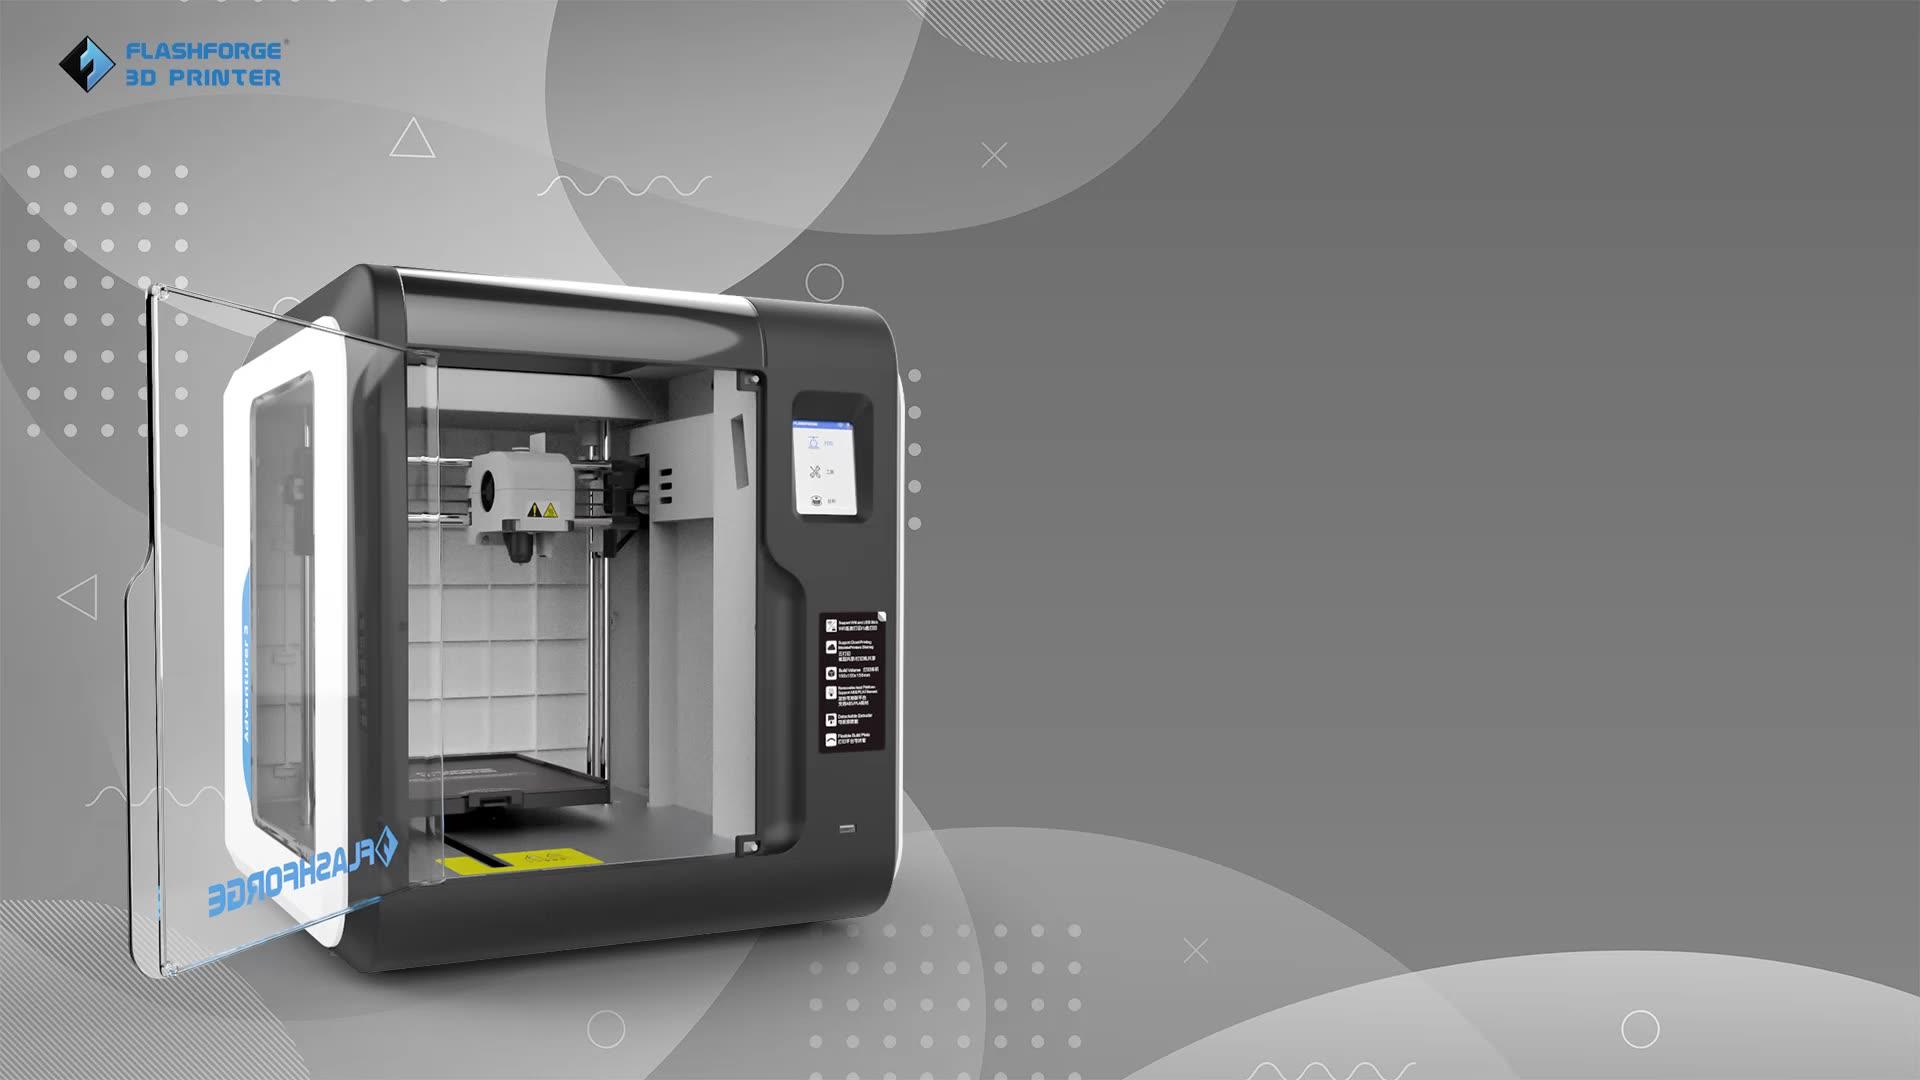 Flashforge Adventurer 3 3D Printer Best 3d Printer for Beginner